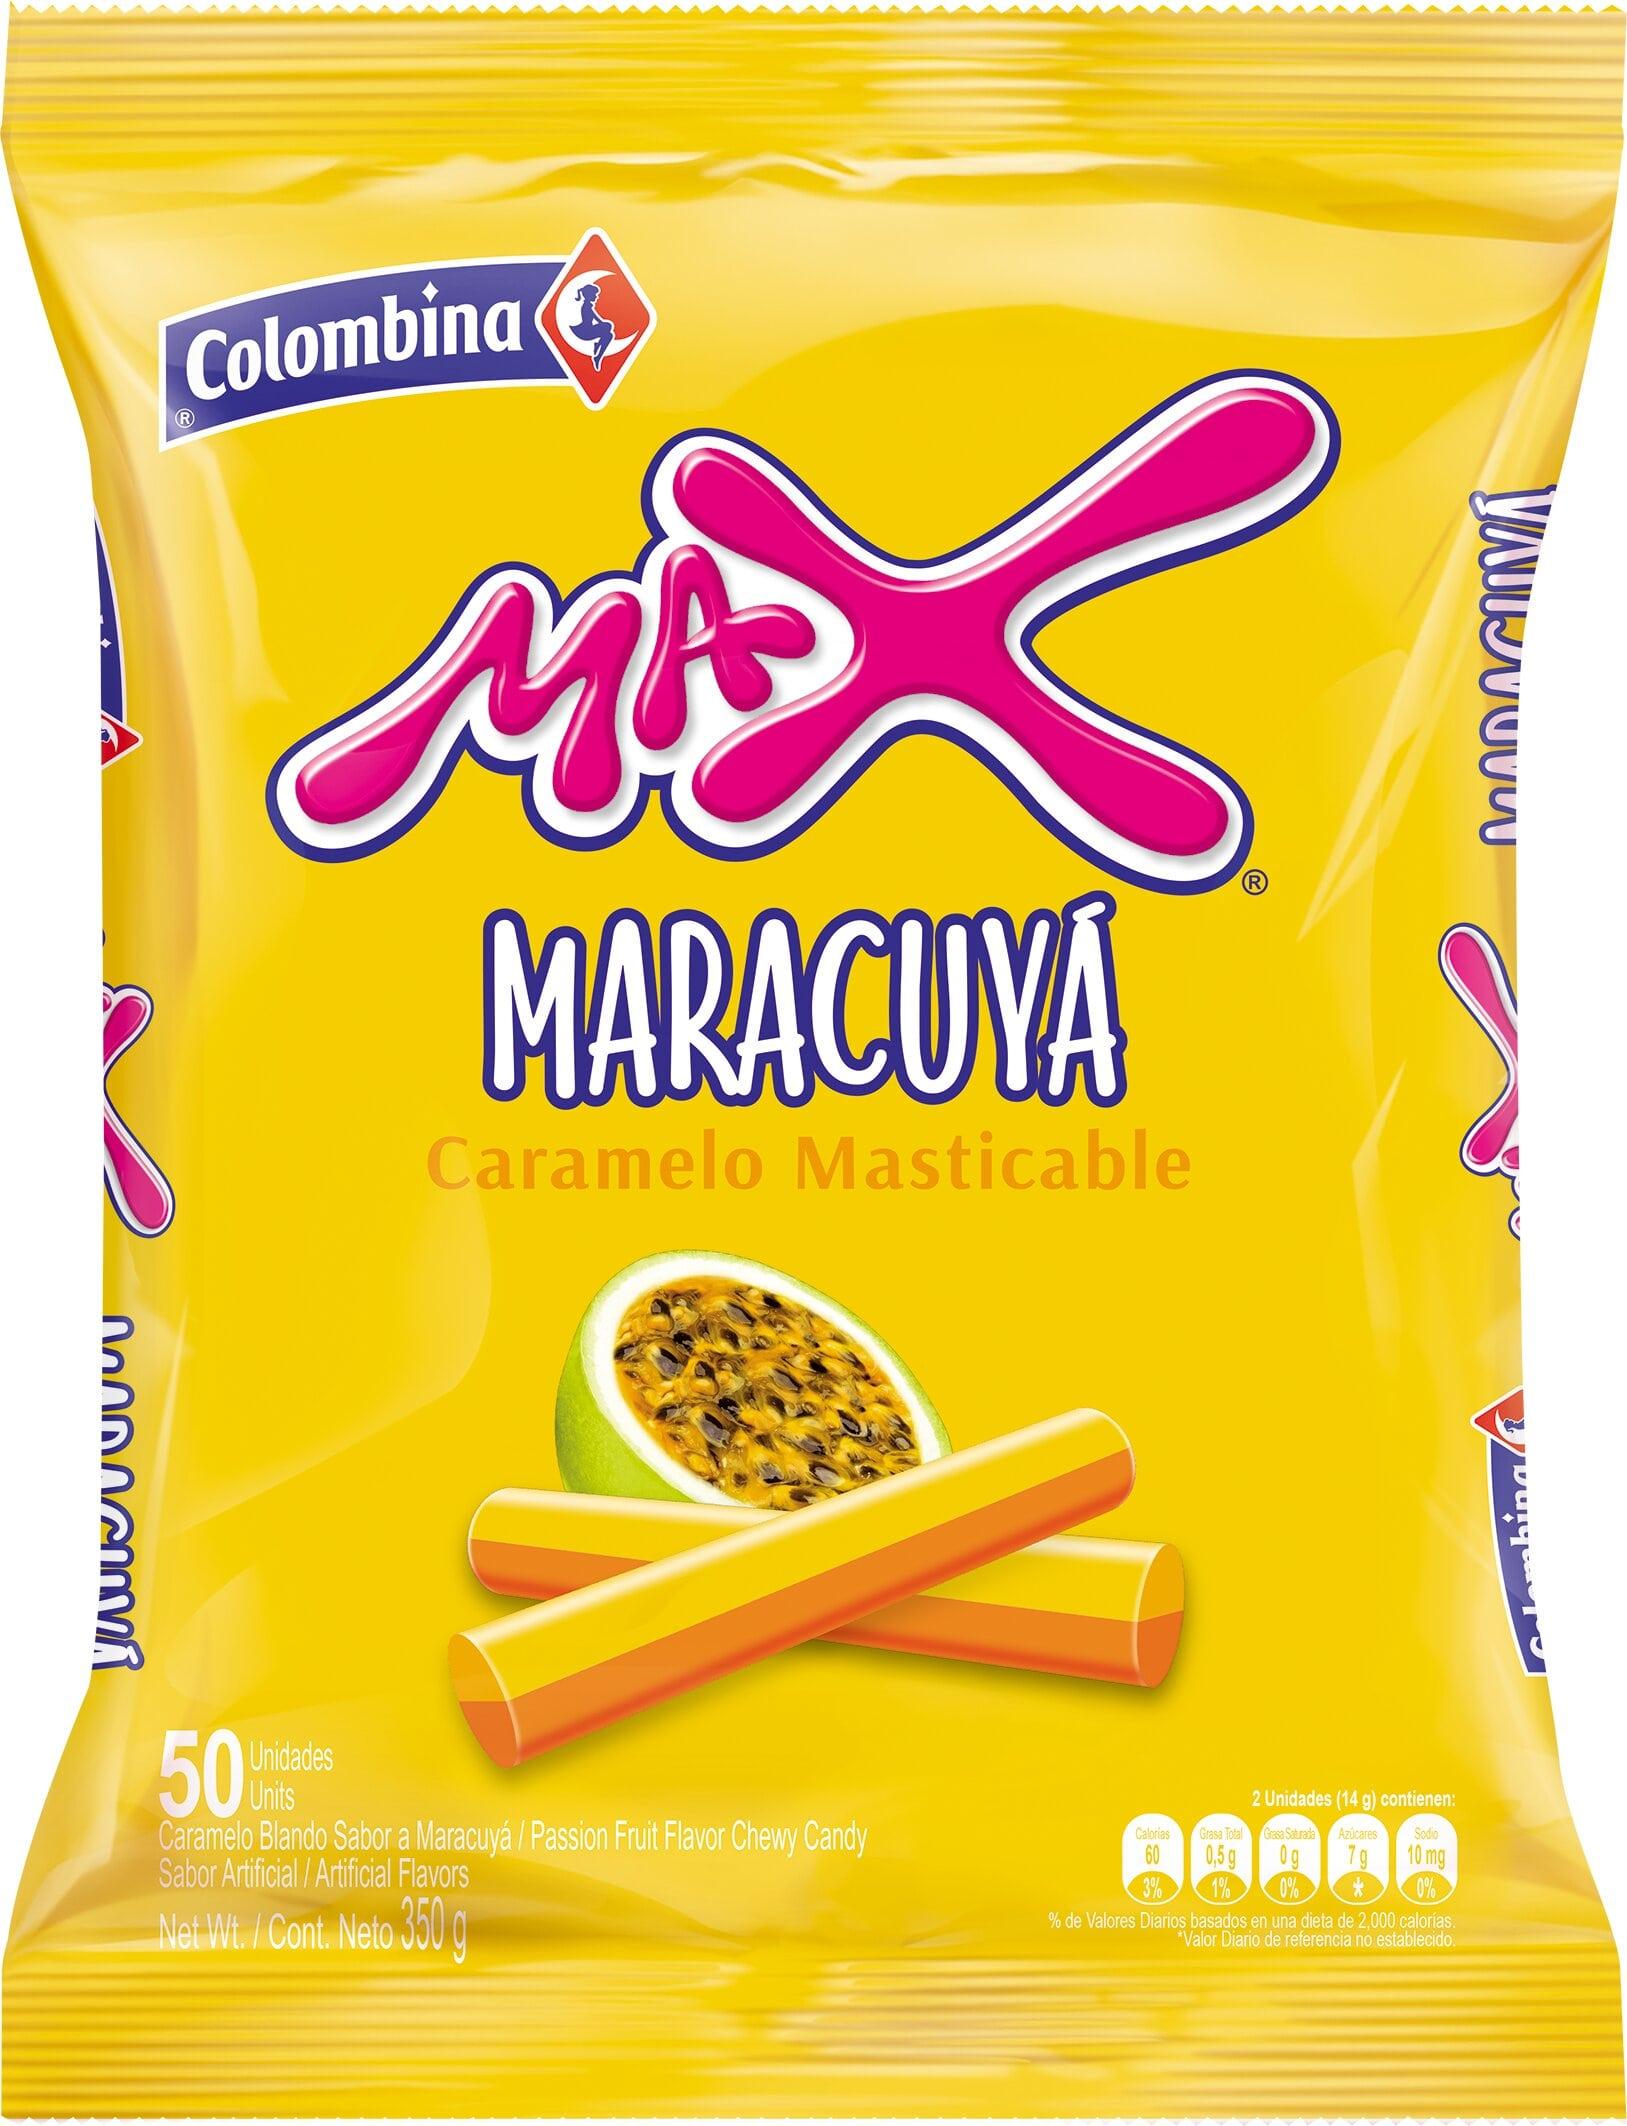 Caramelo max Maracuya X50u 350g